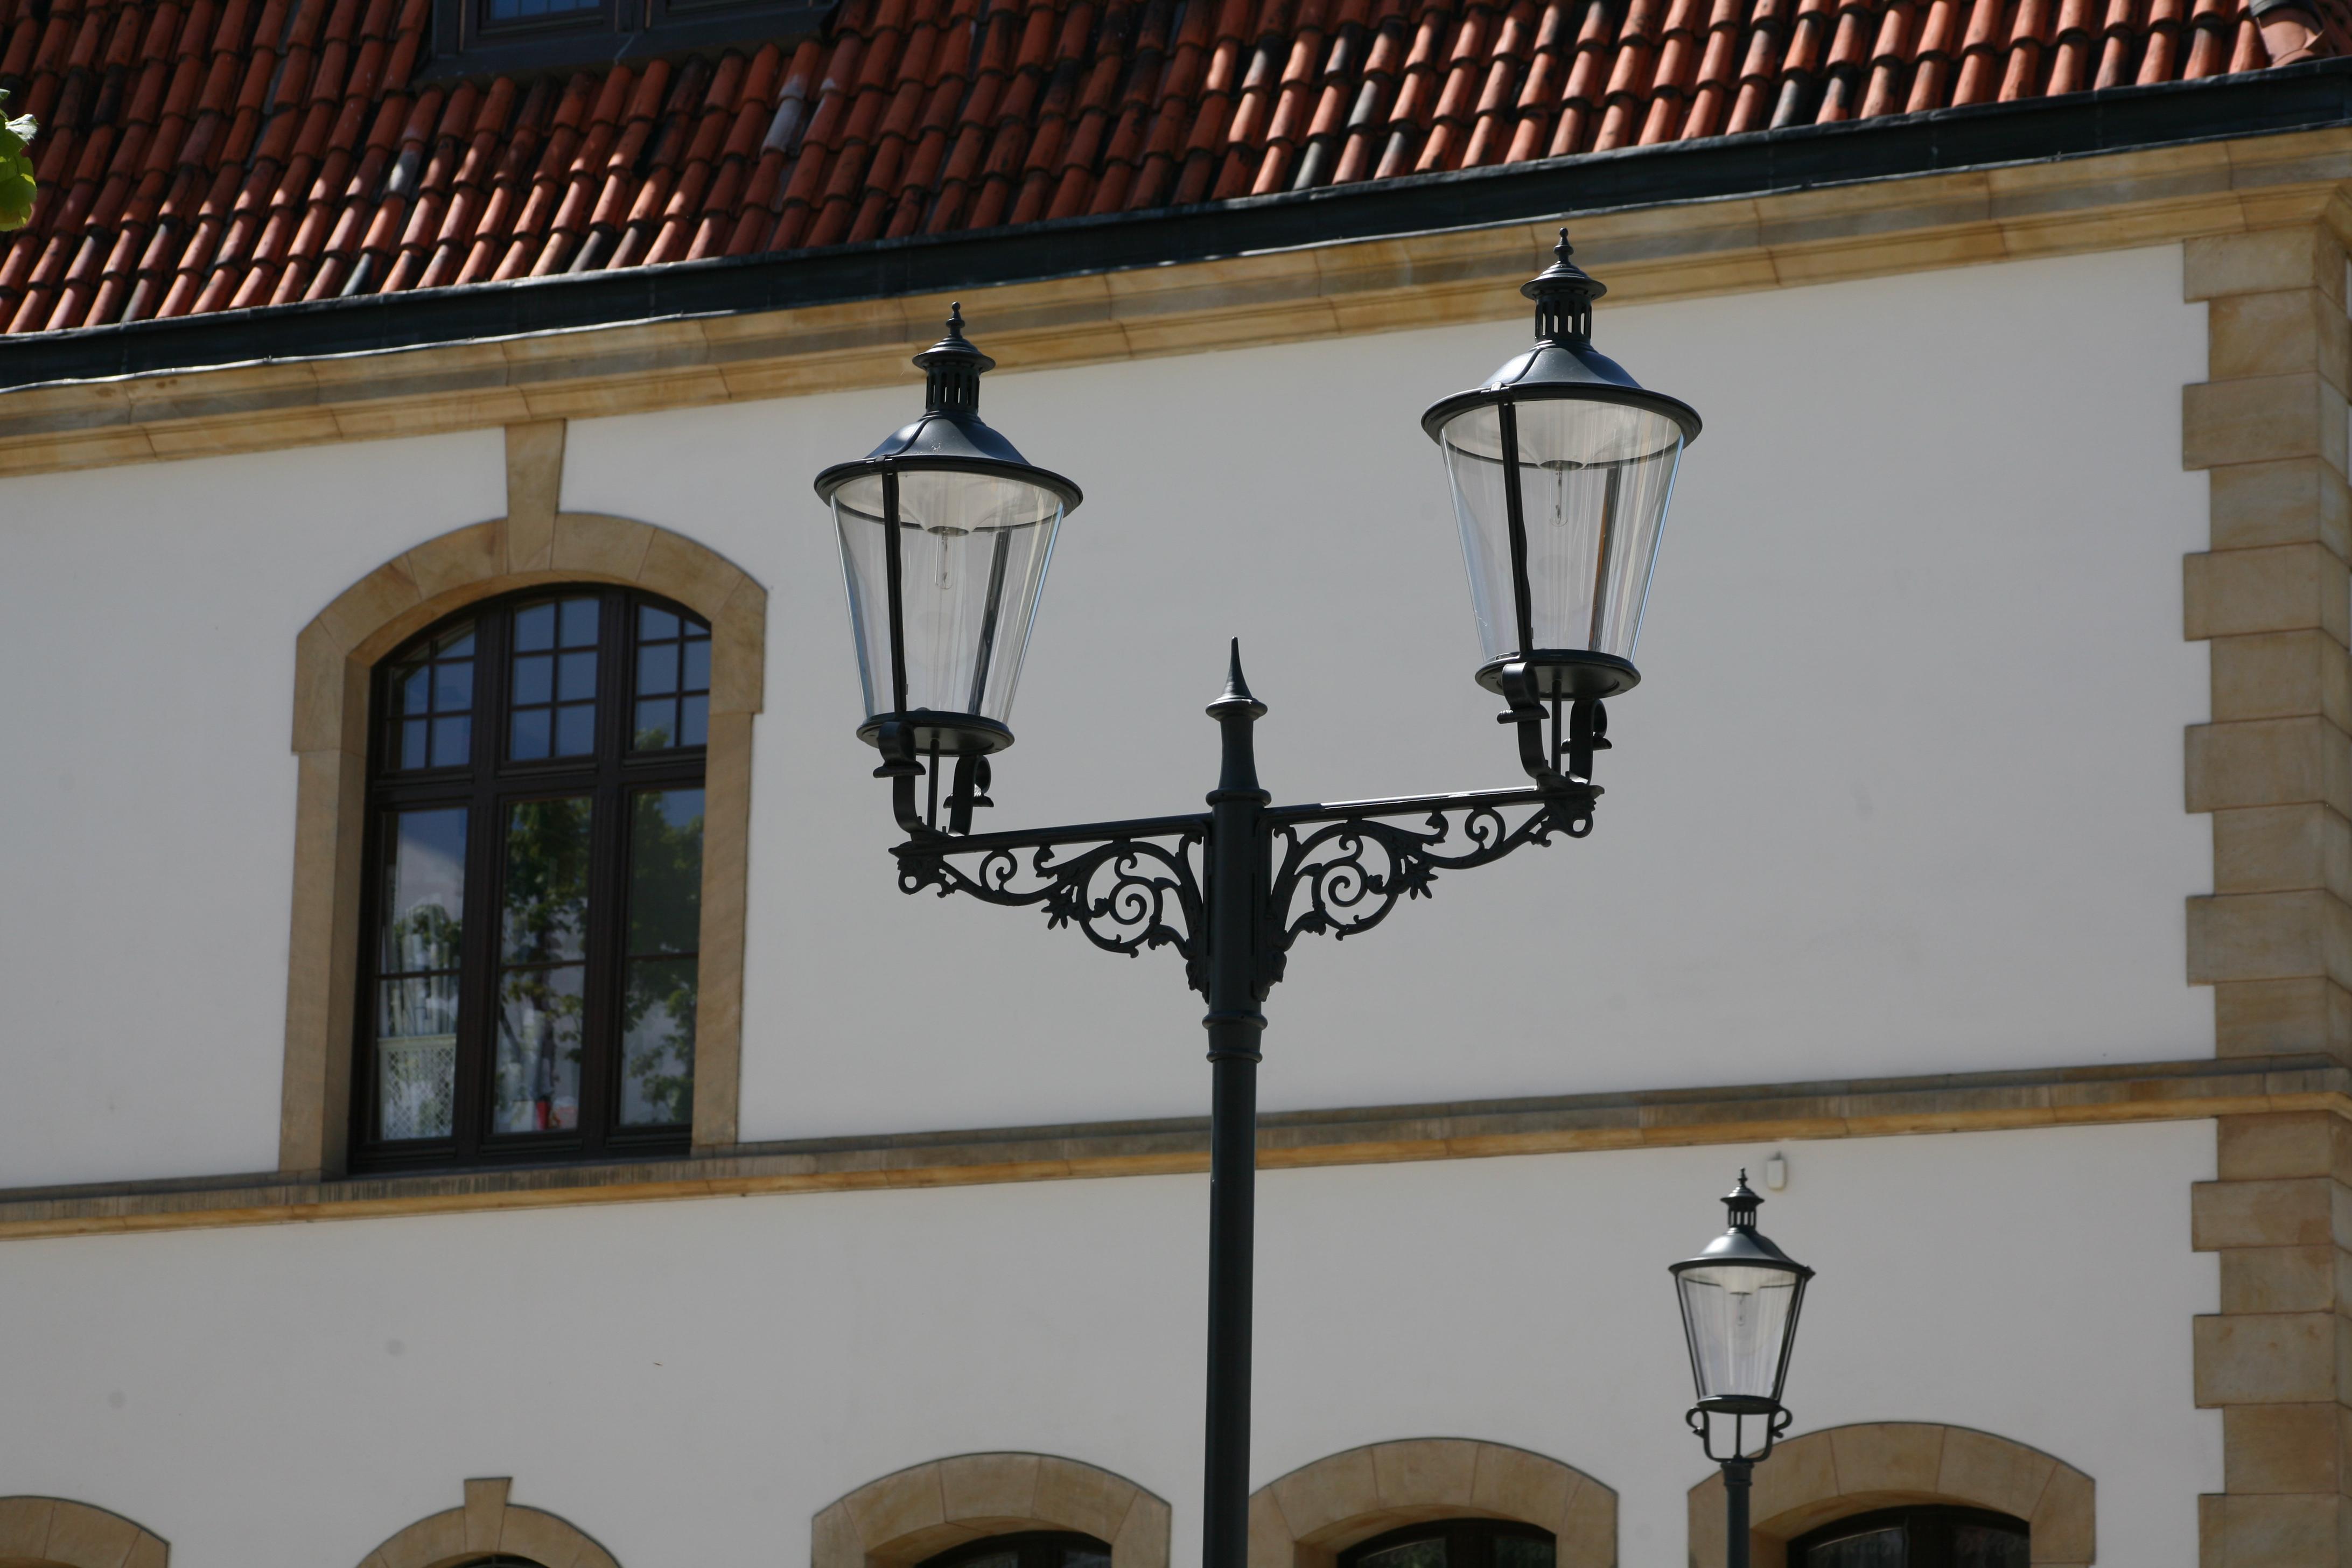 latarnia stylizowana. latarnia uliczna, latarnia LED